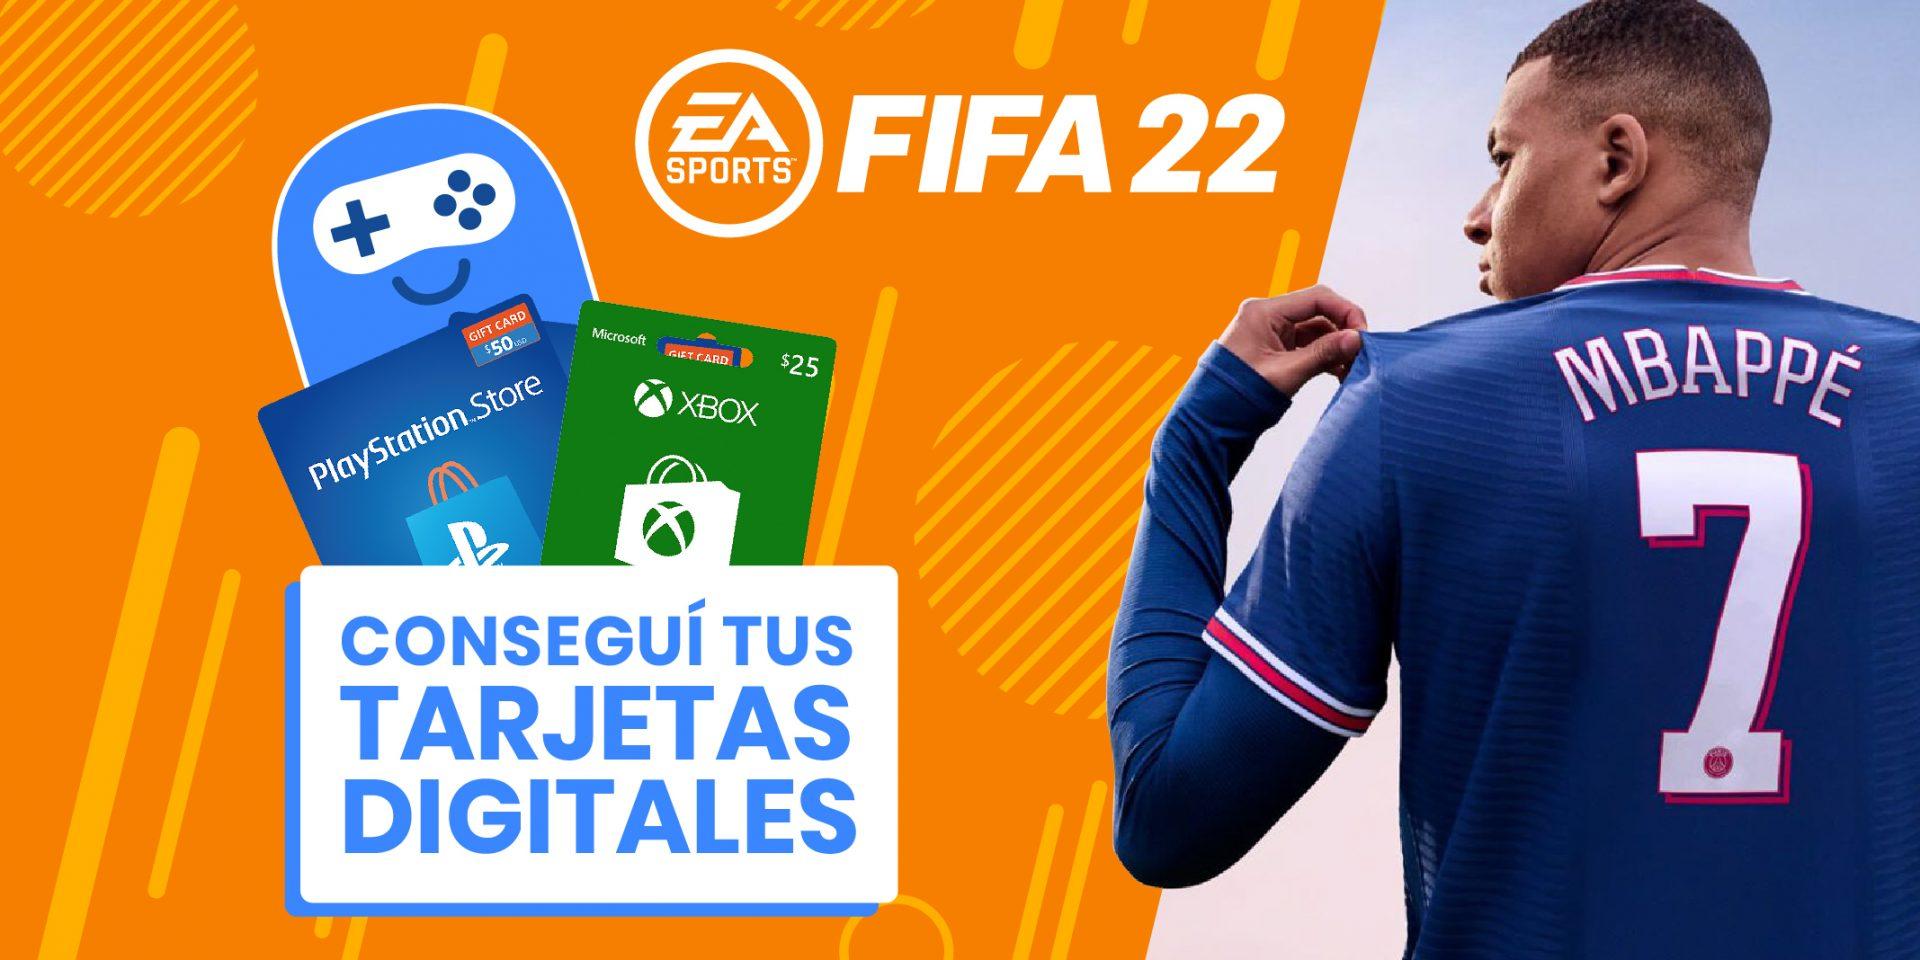 FIFA-22-Gamer24hs-Cultura-Geek